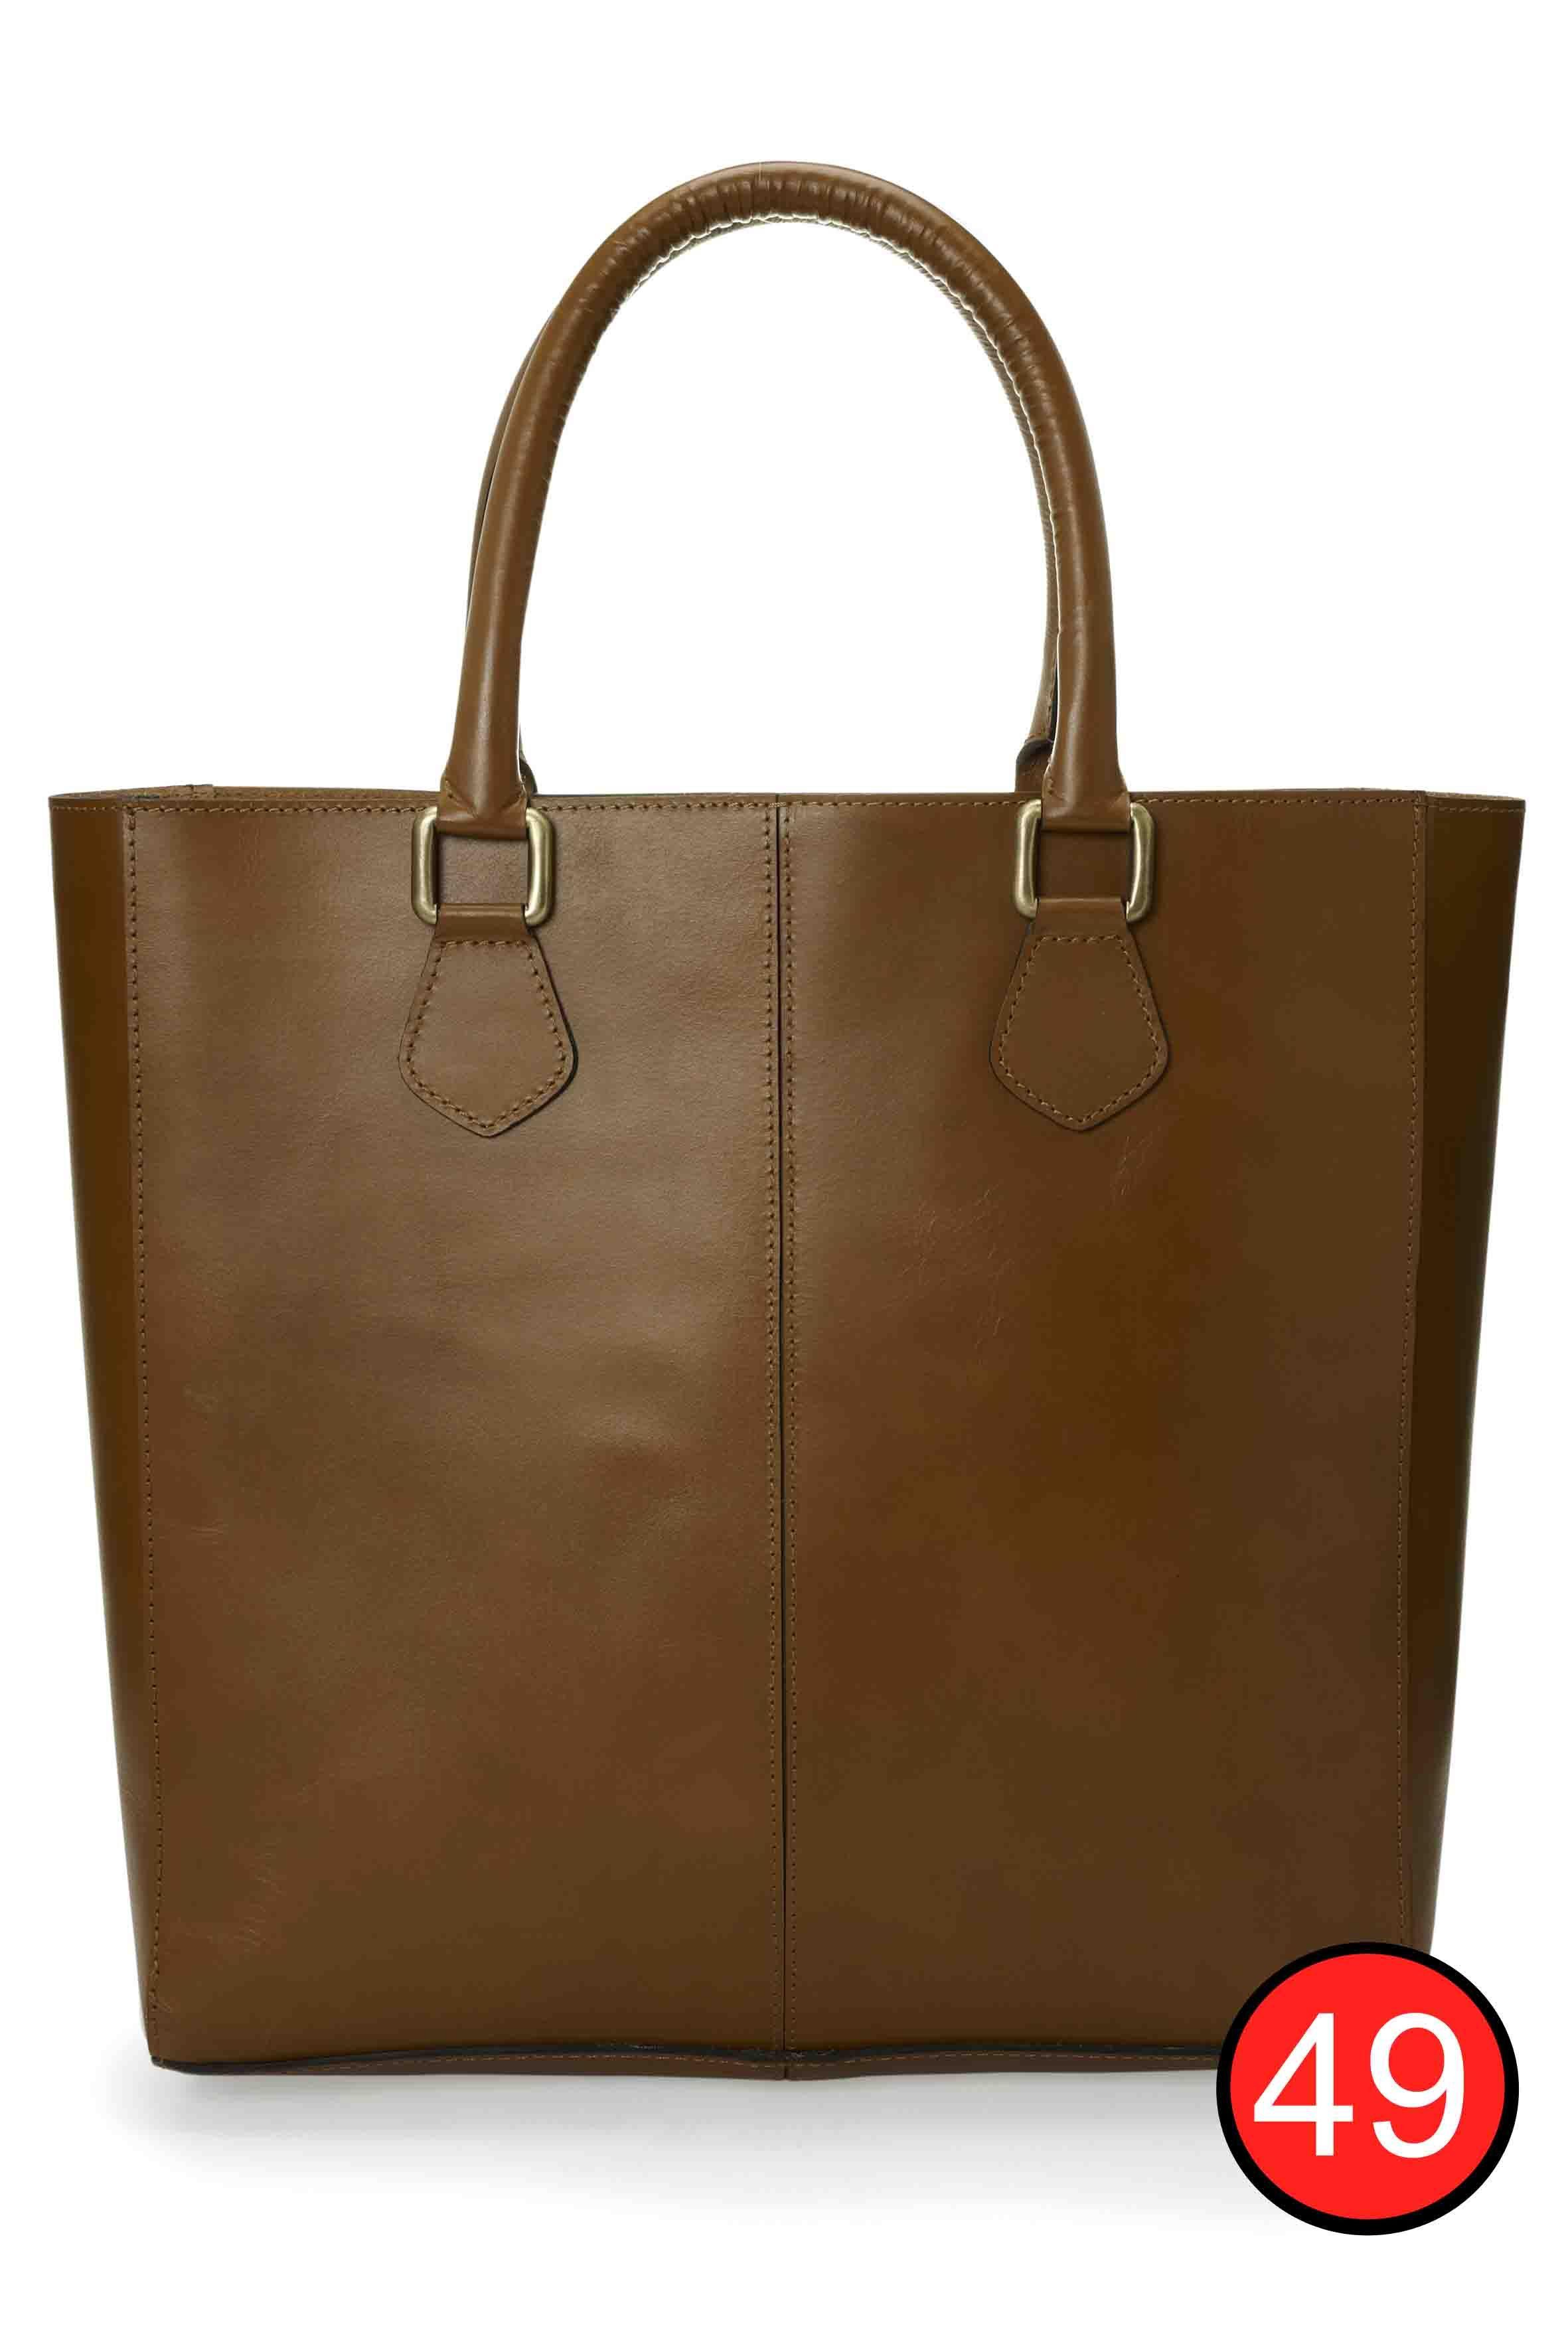 Leather Tan Premium Tote #nextbingo